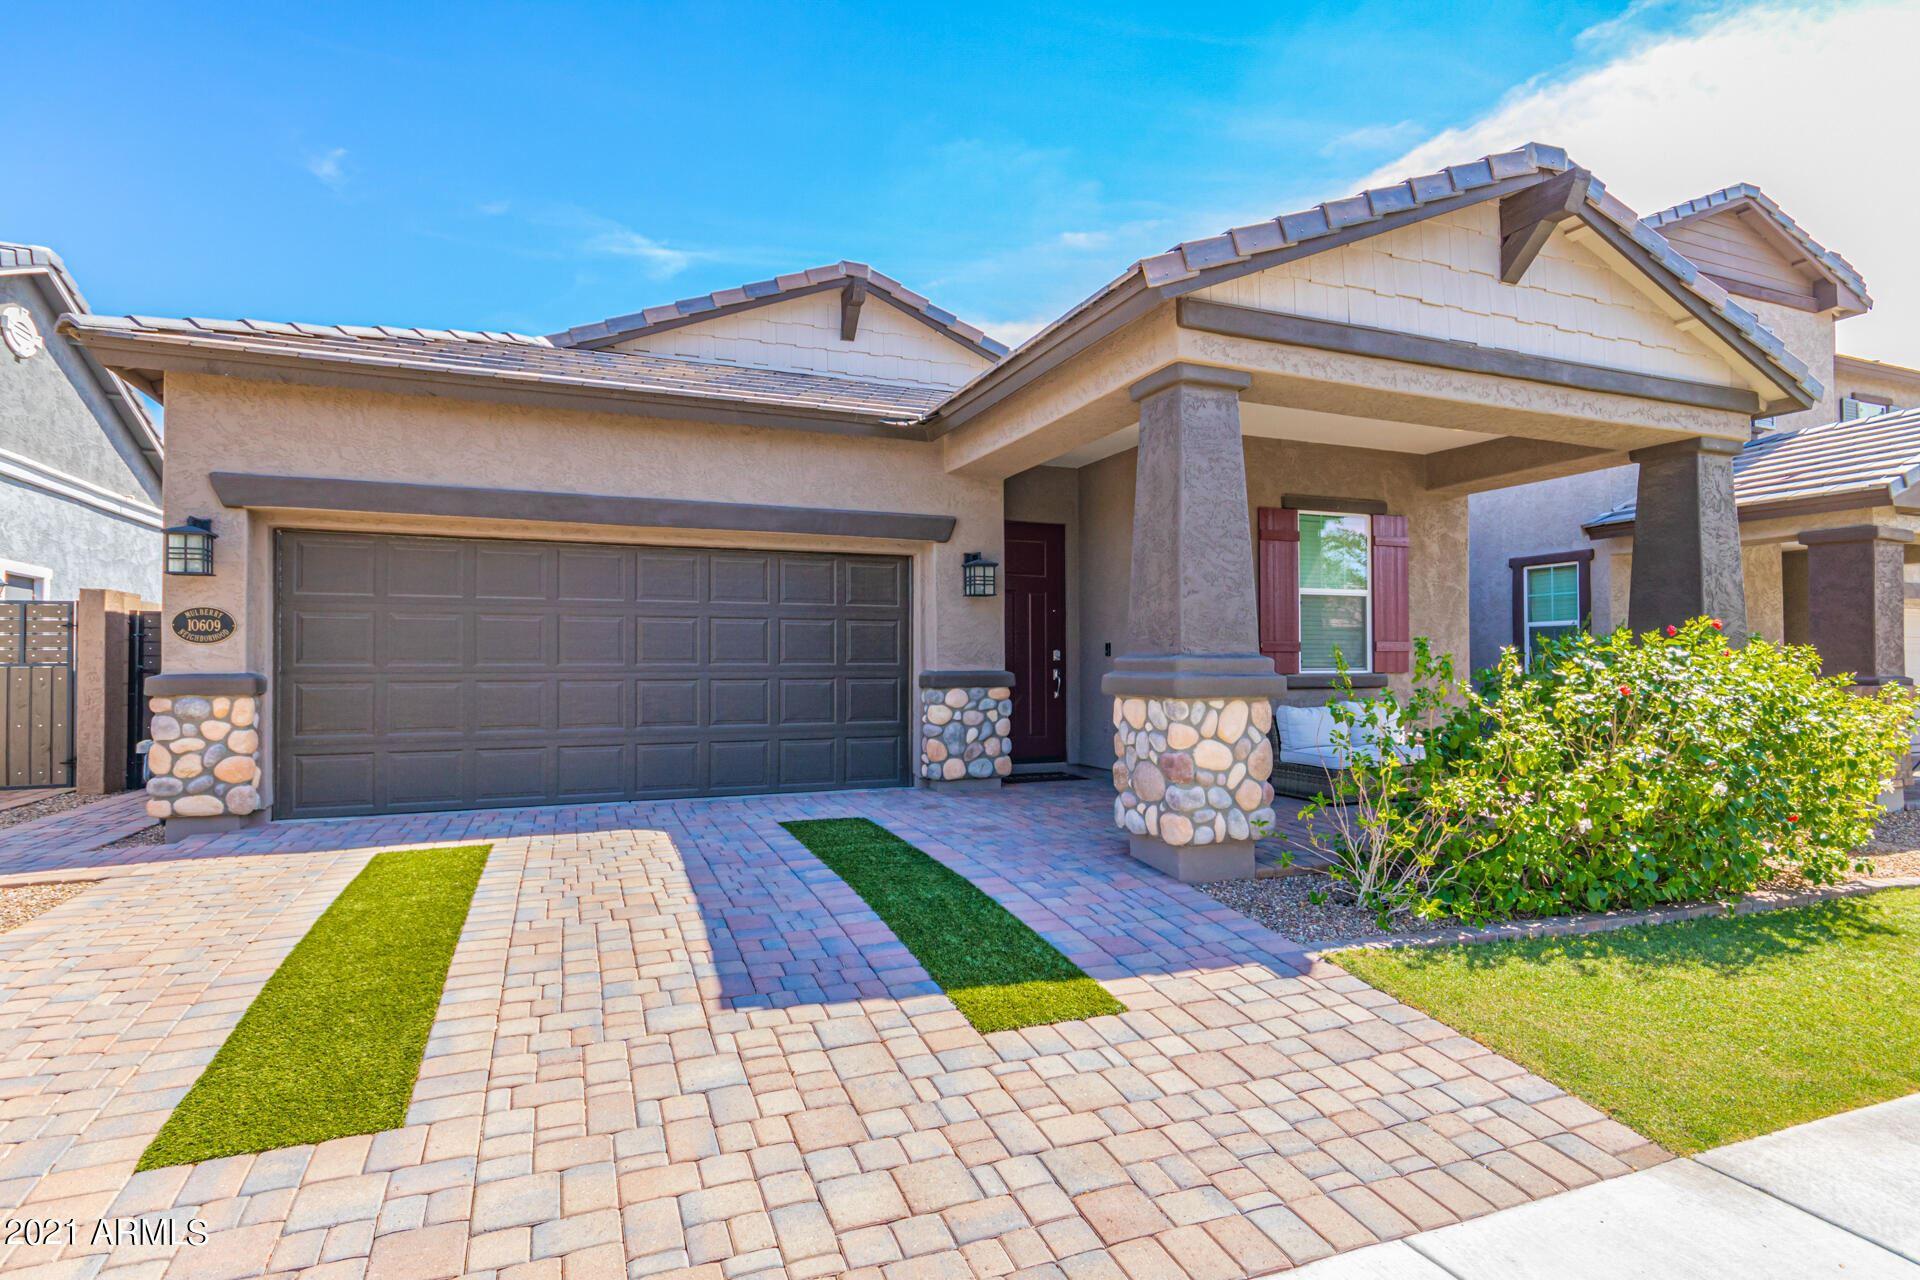 10609 E NARANJA Avenue, Mesa, AZ 85209 - MLS#: 6268169